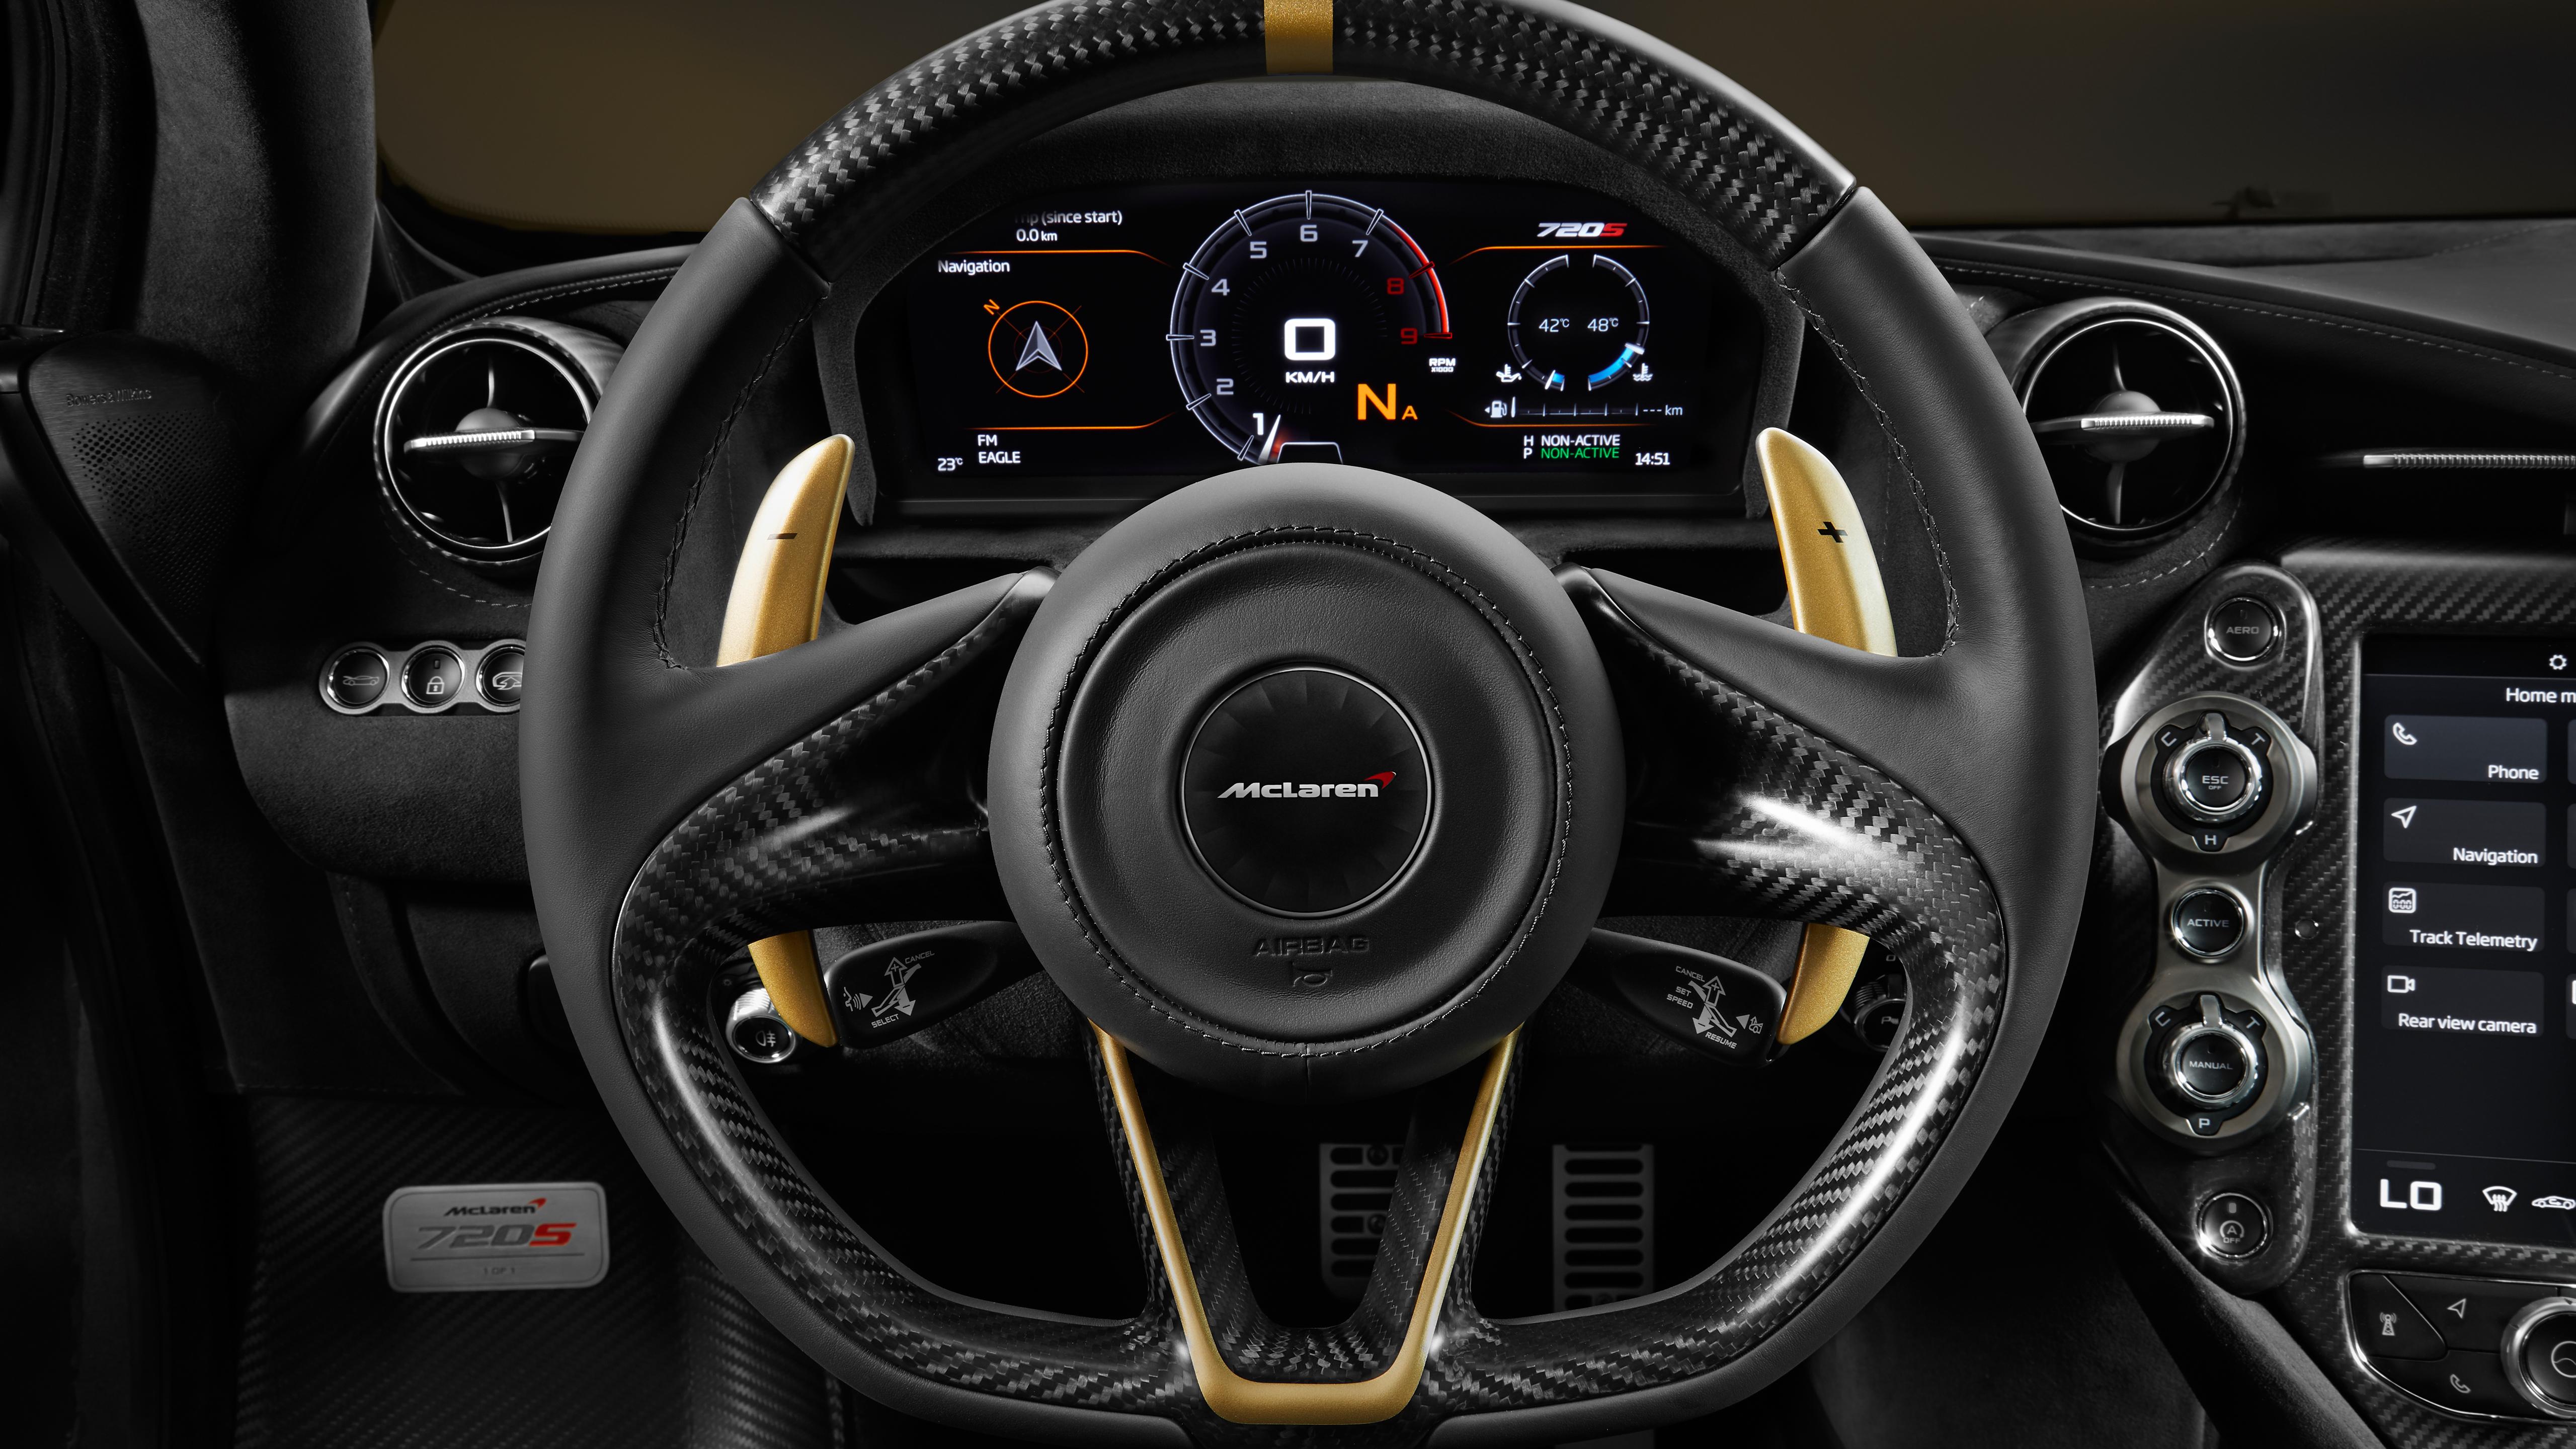 Mclaren 720s Grey Gold Interior 5k Wallpaper Hd Car